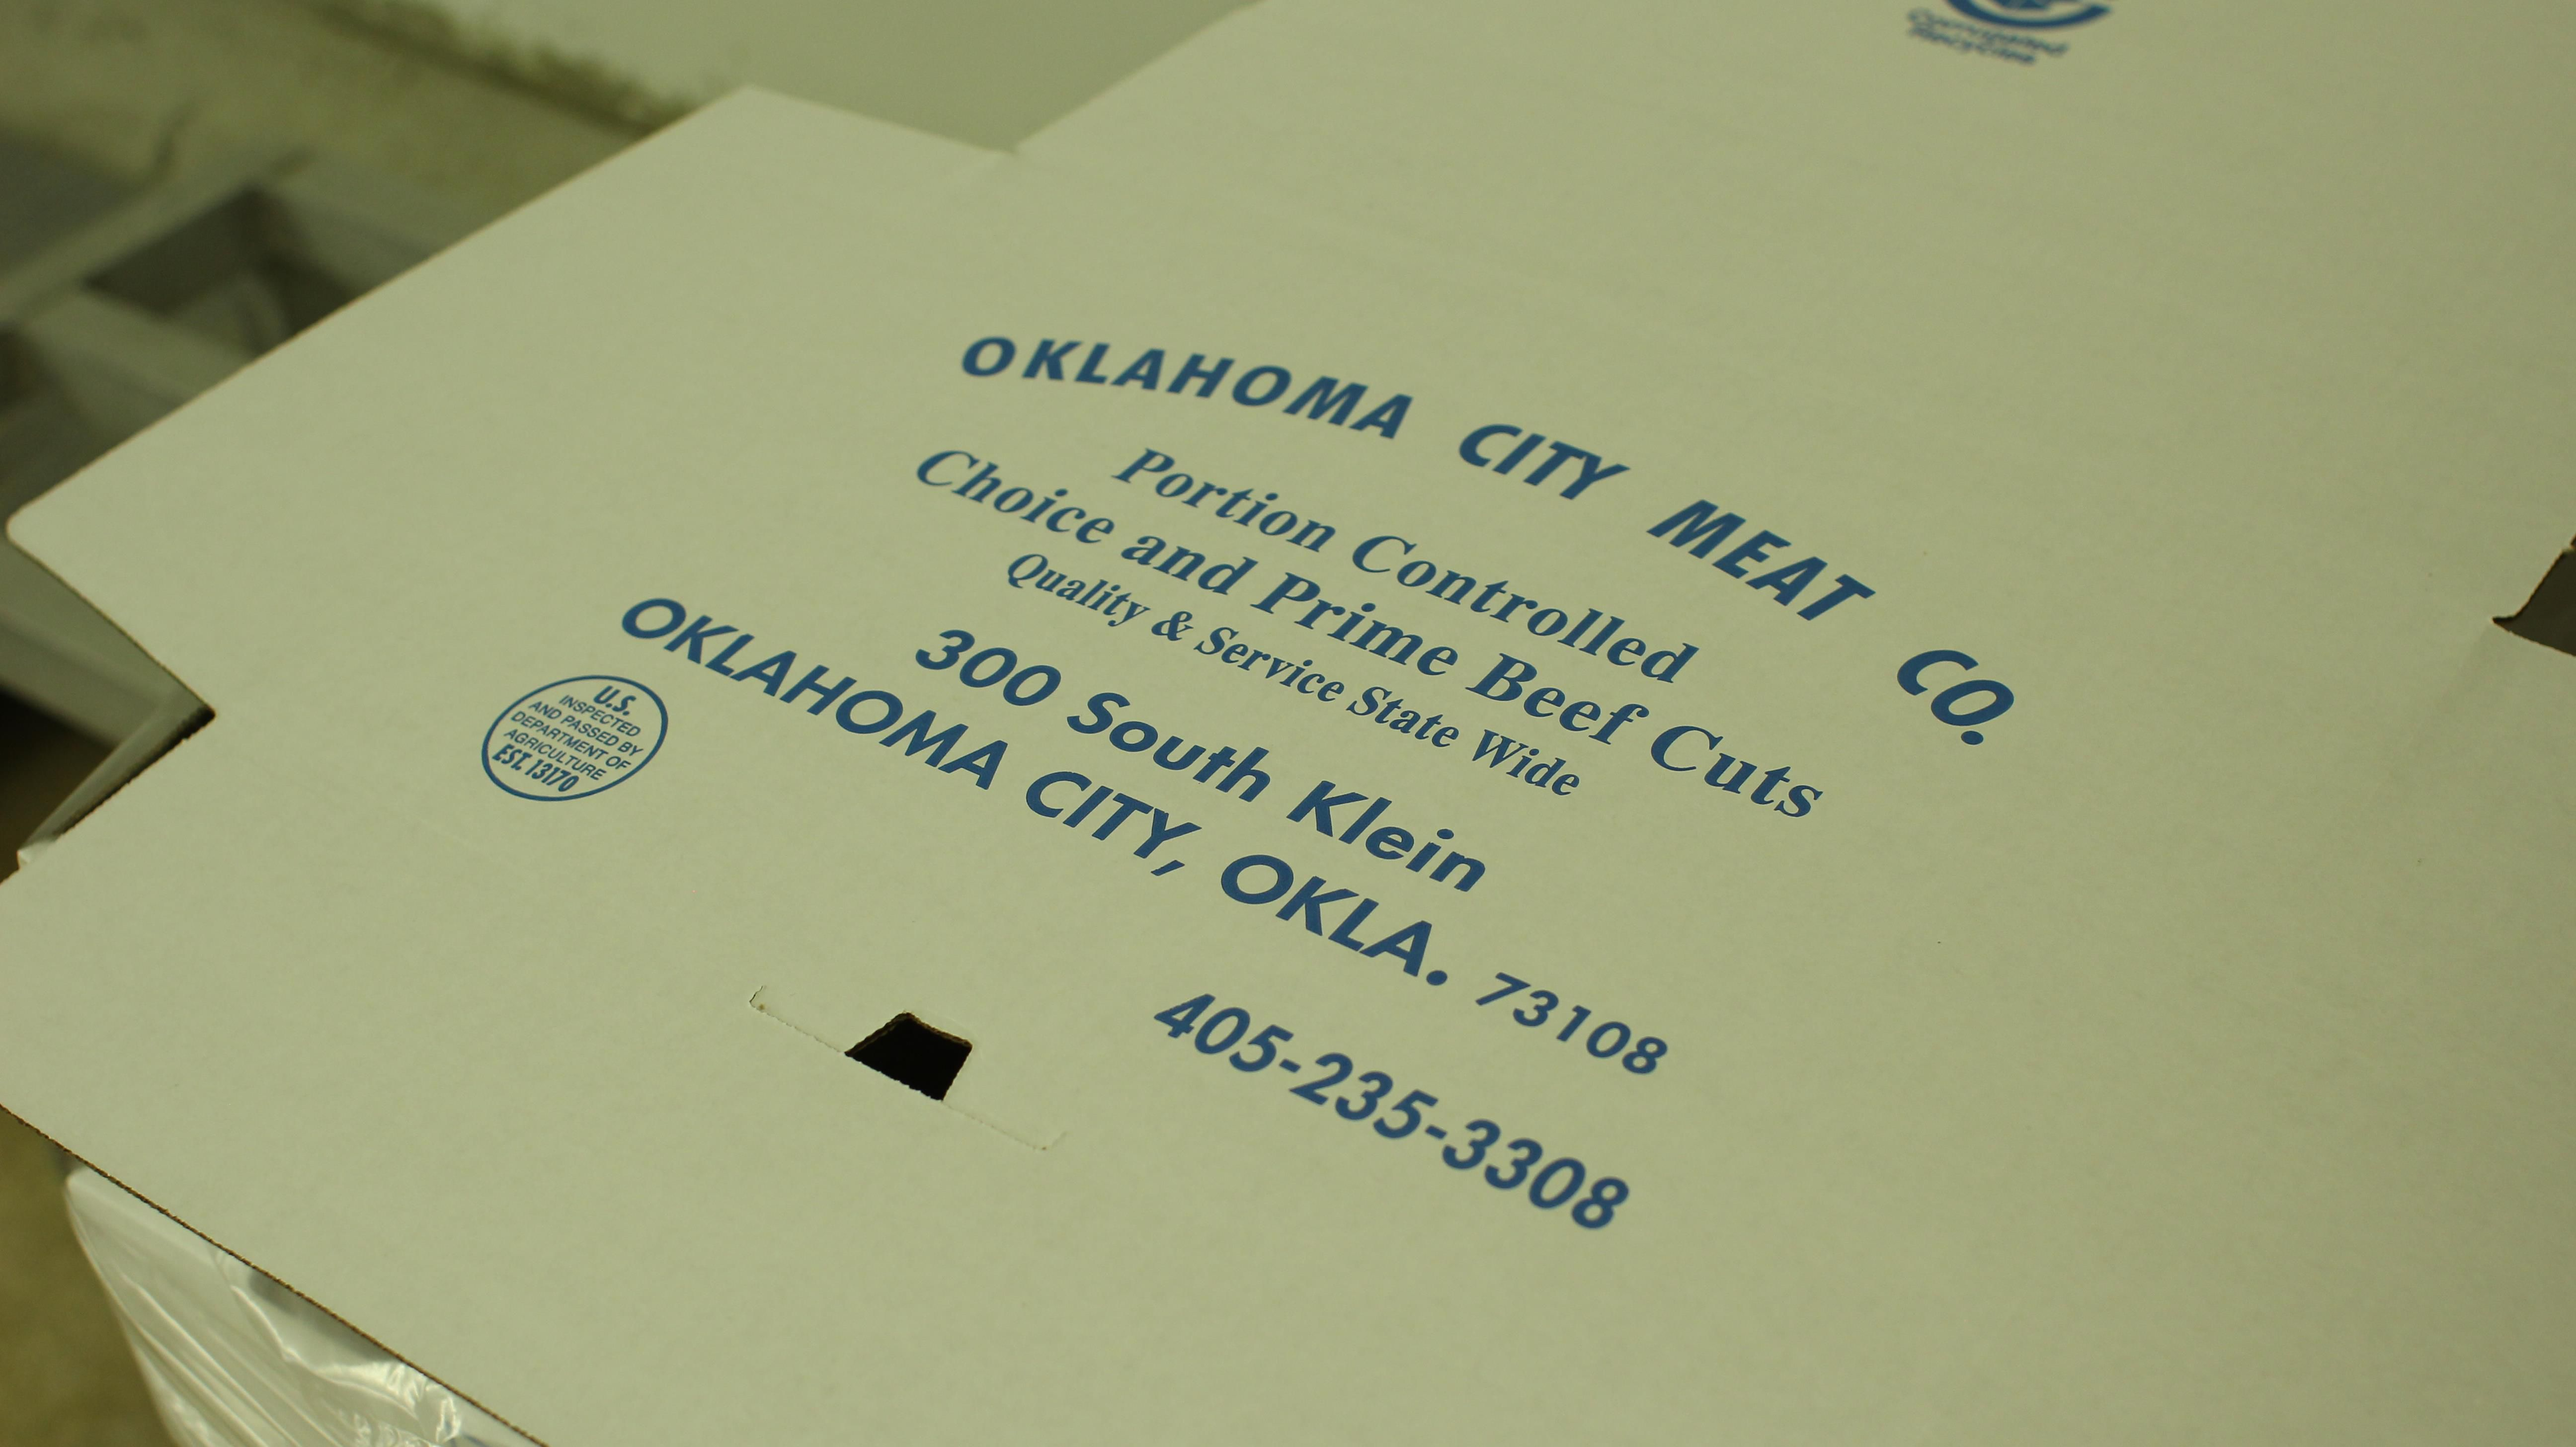 Gallery - Oklahoma City Meat Co